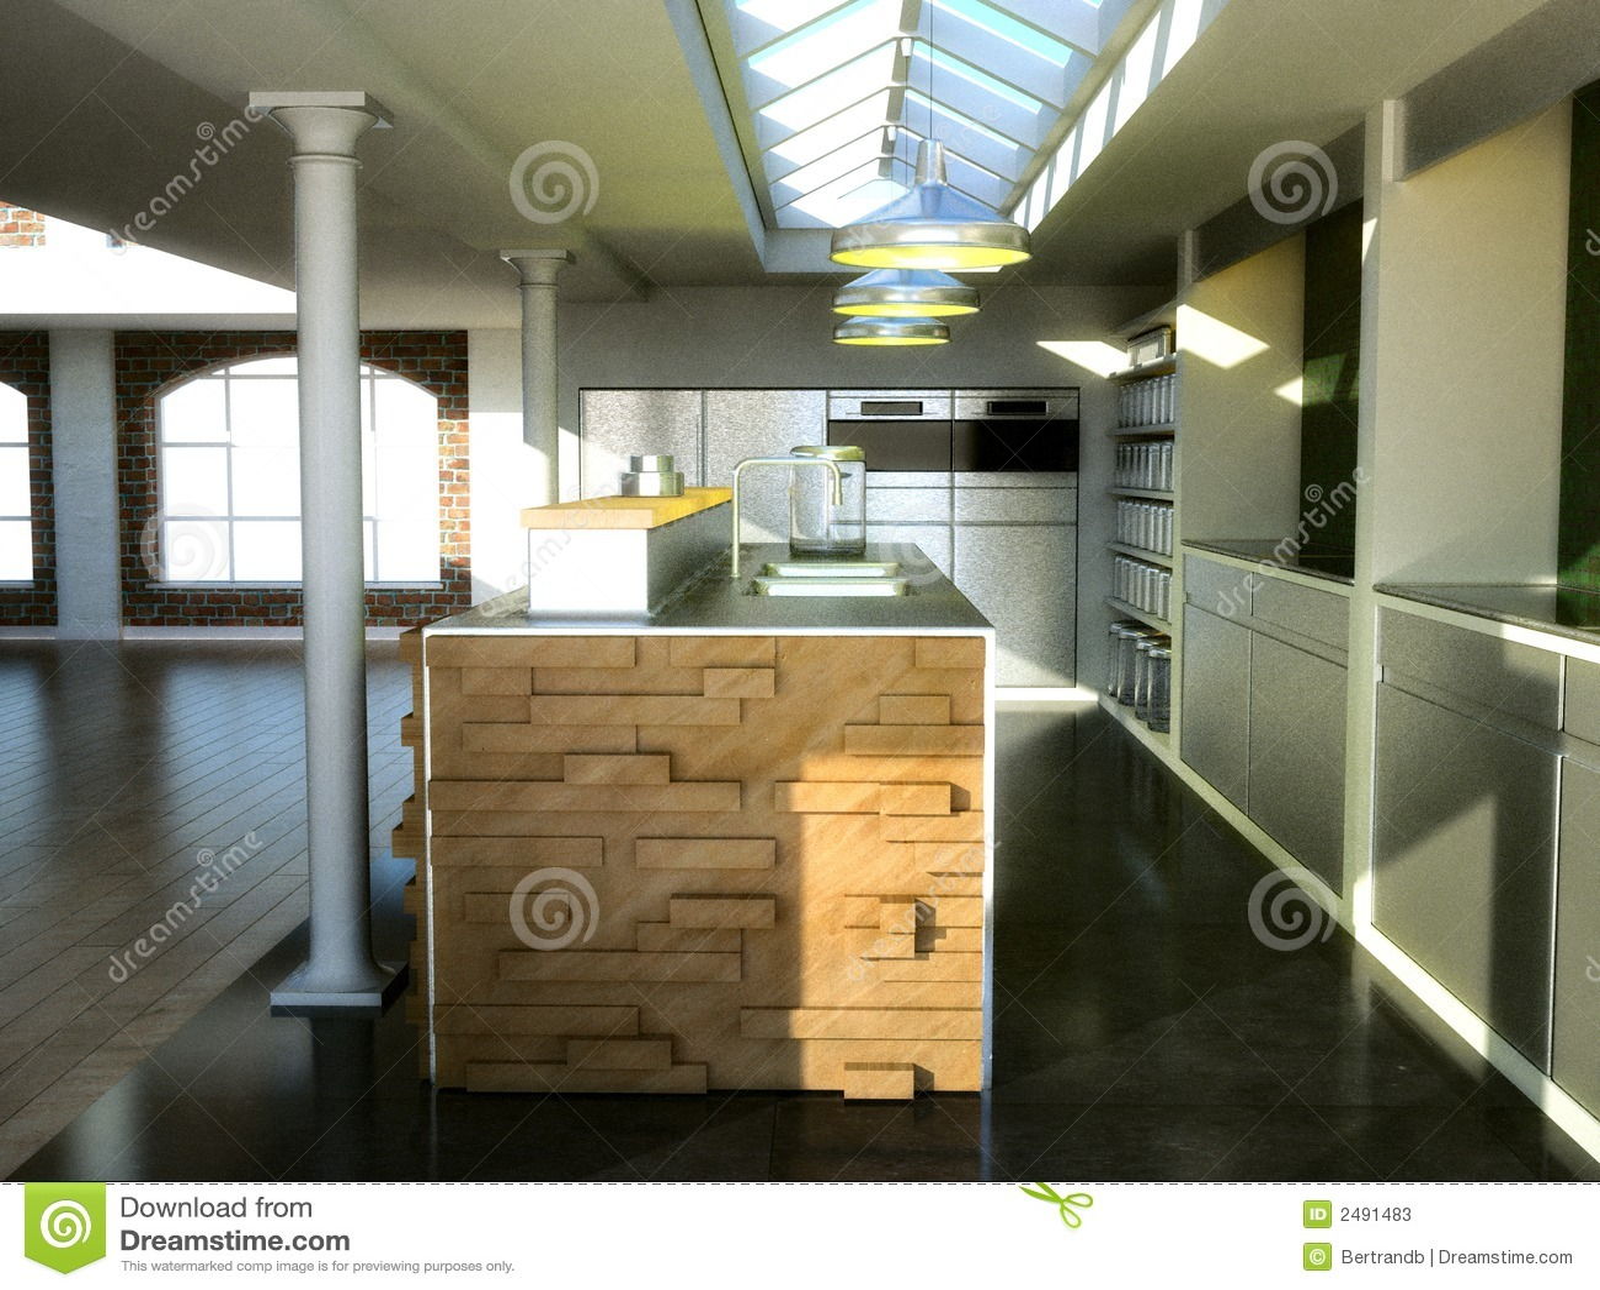 Loft Kitchen Exclusive Loft Kitchen Stock Photos Image 2491483